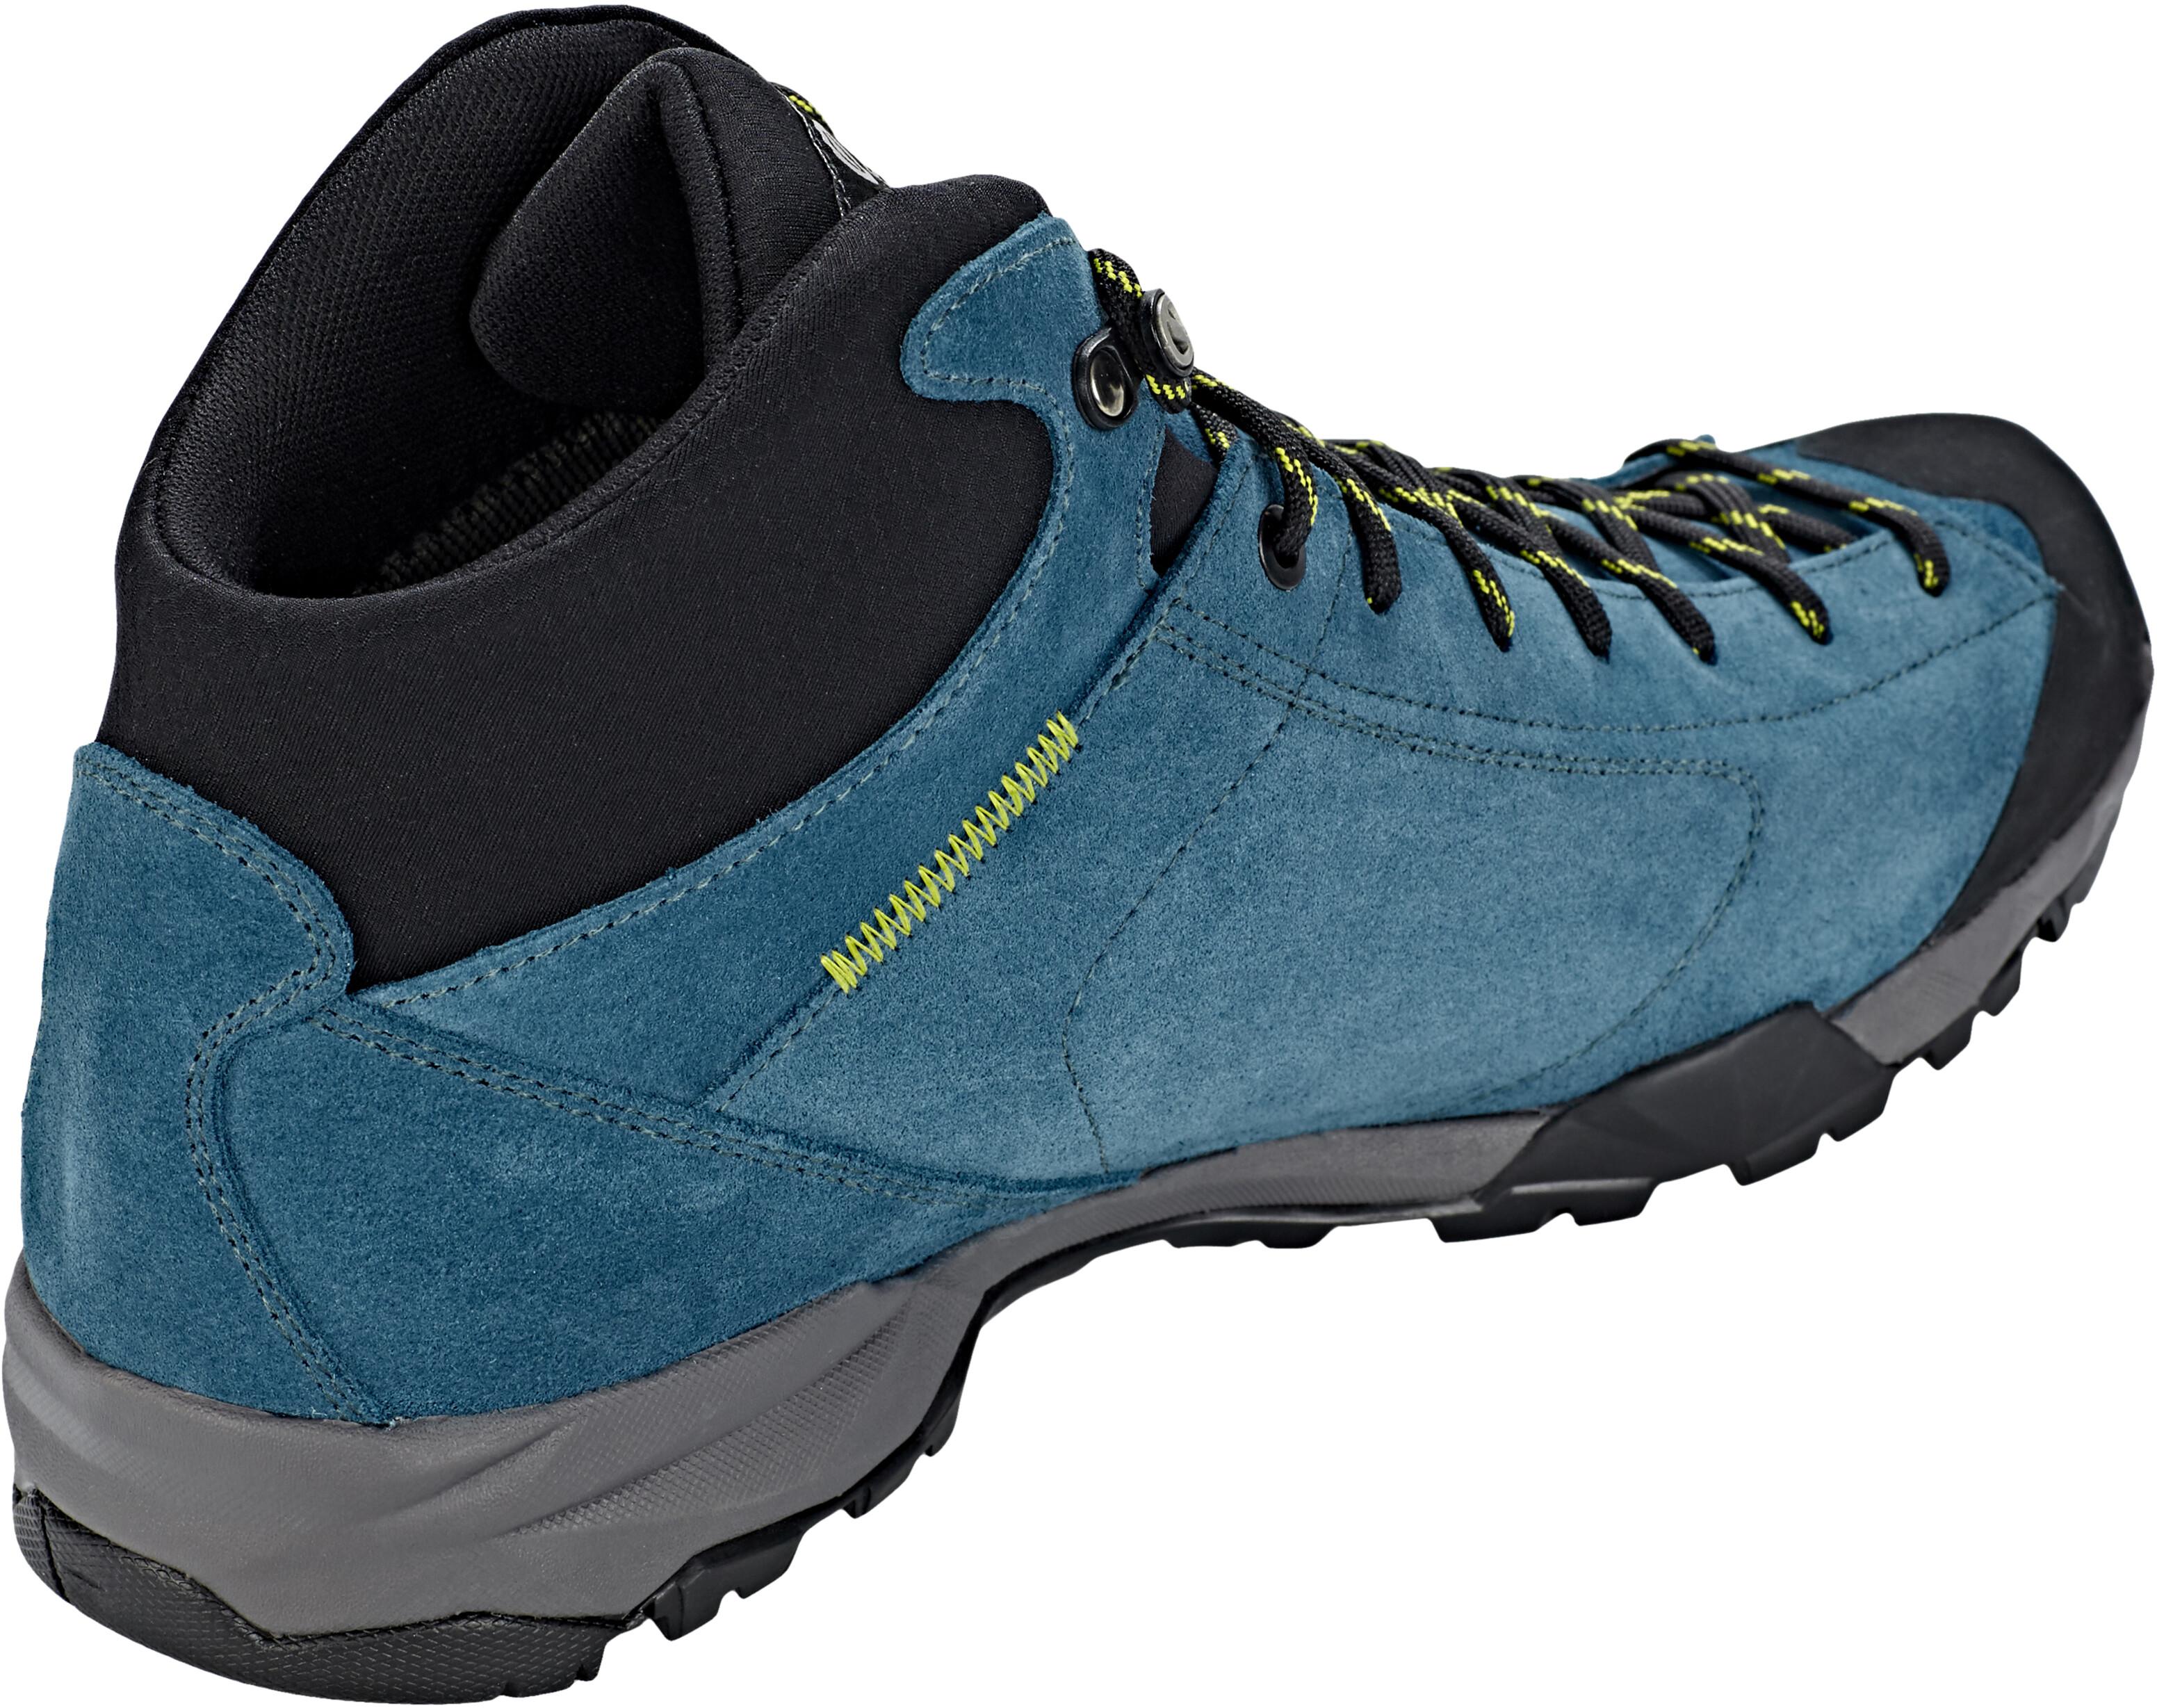 7ff0d581fab6 Scarpa Mojito Hike GTX Shoes Men lakeblue at Addnature.co.uk